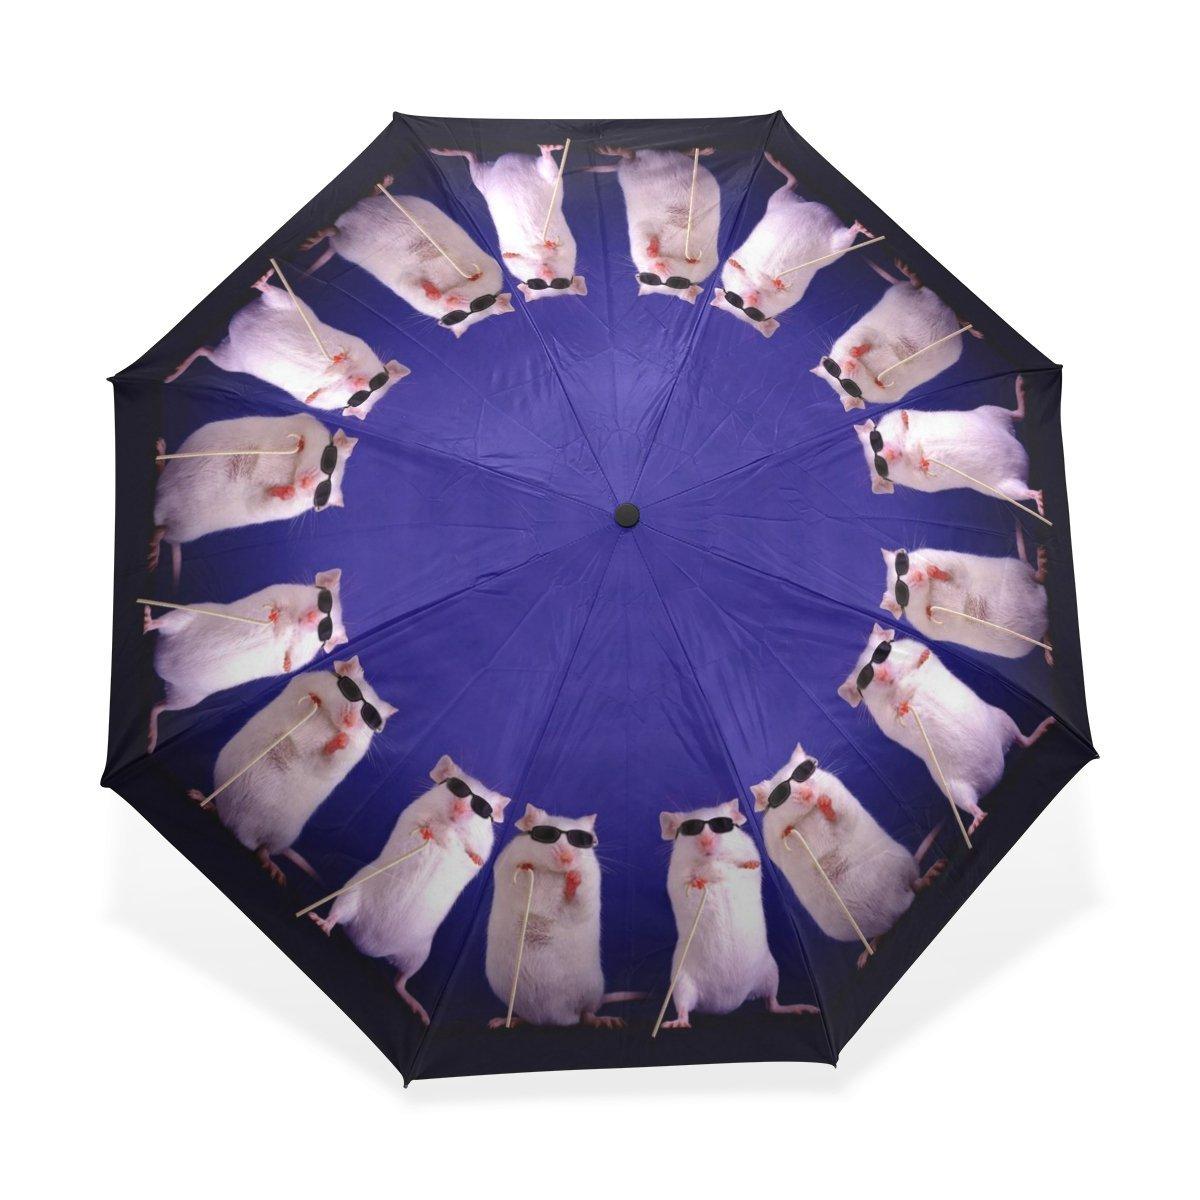 baihuishop防風ゴルフ傘、コンパクトで旅行for Easy Carryingスポーツ雨傘 – 強力なフレームUnbreakable Galaxyパターン   B01G6RPK5K